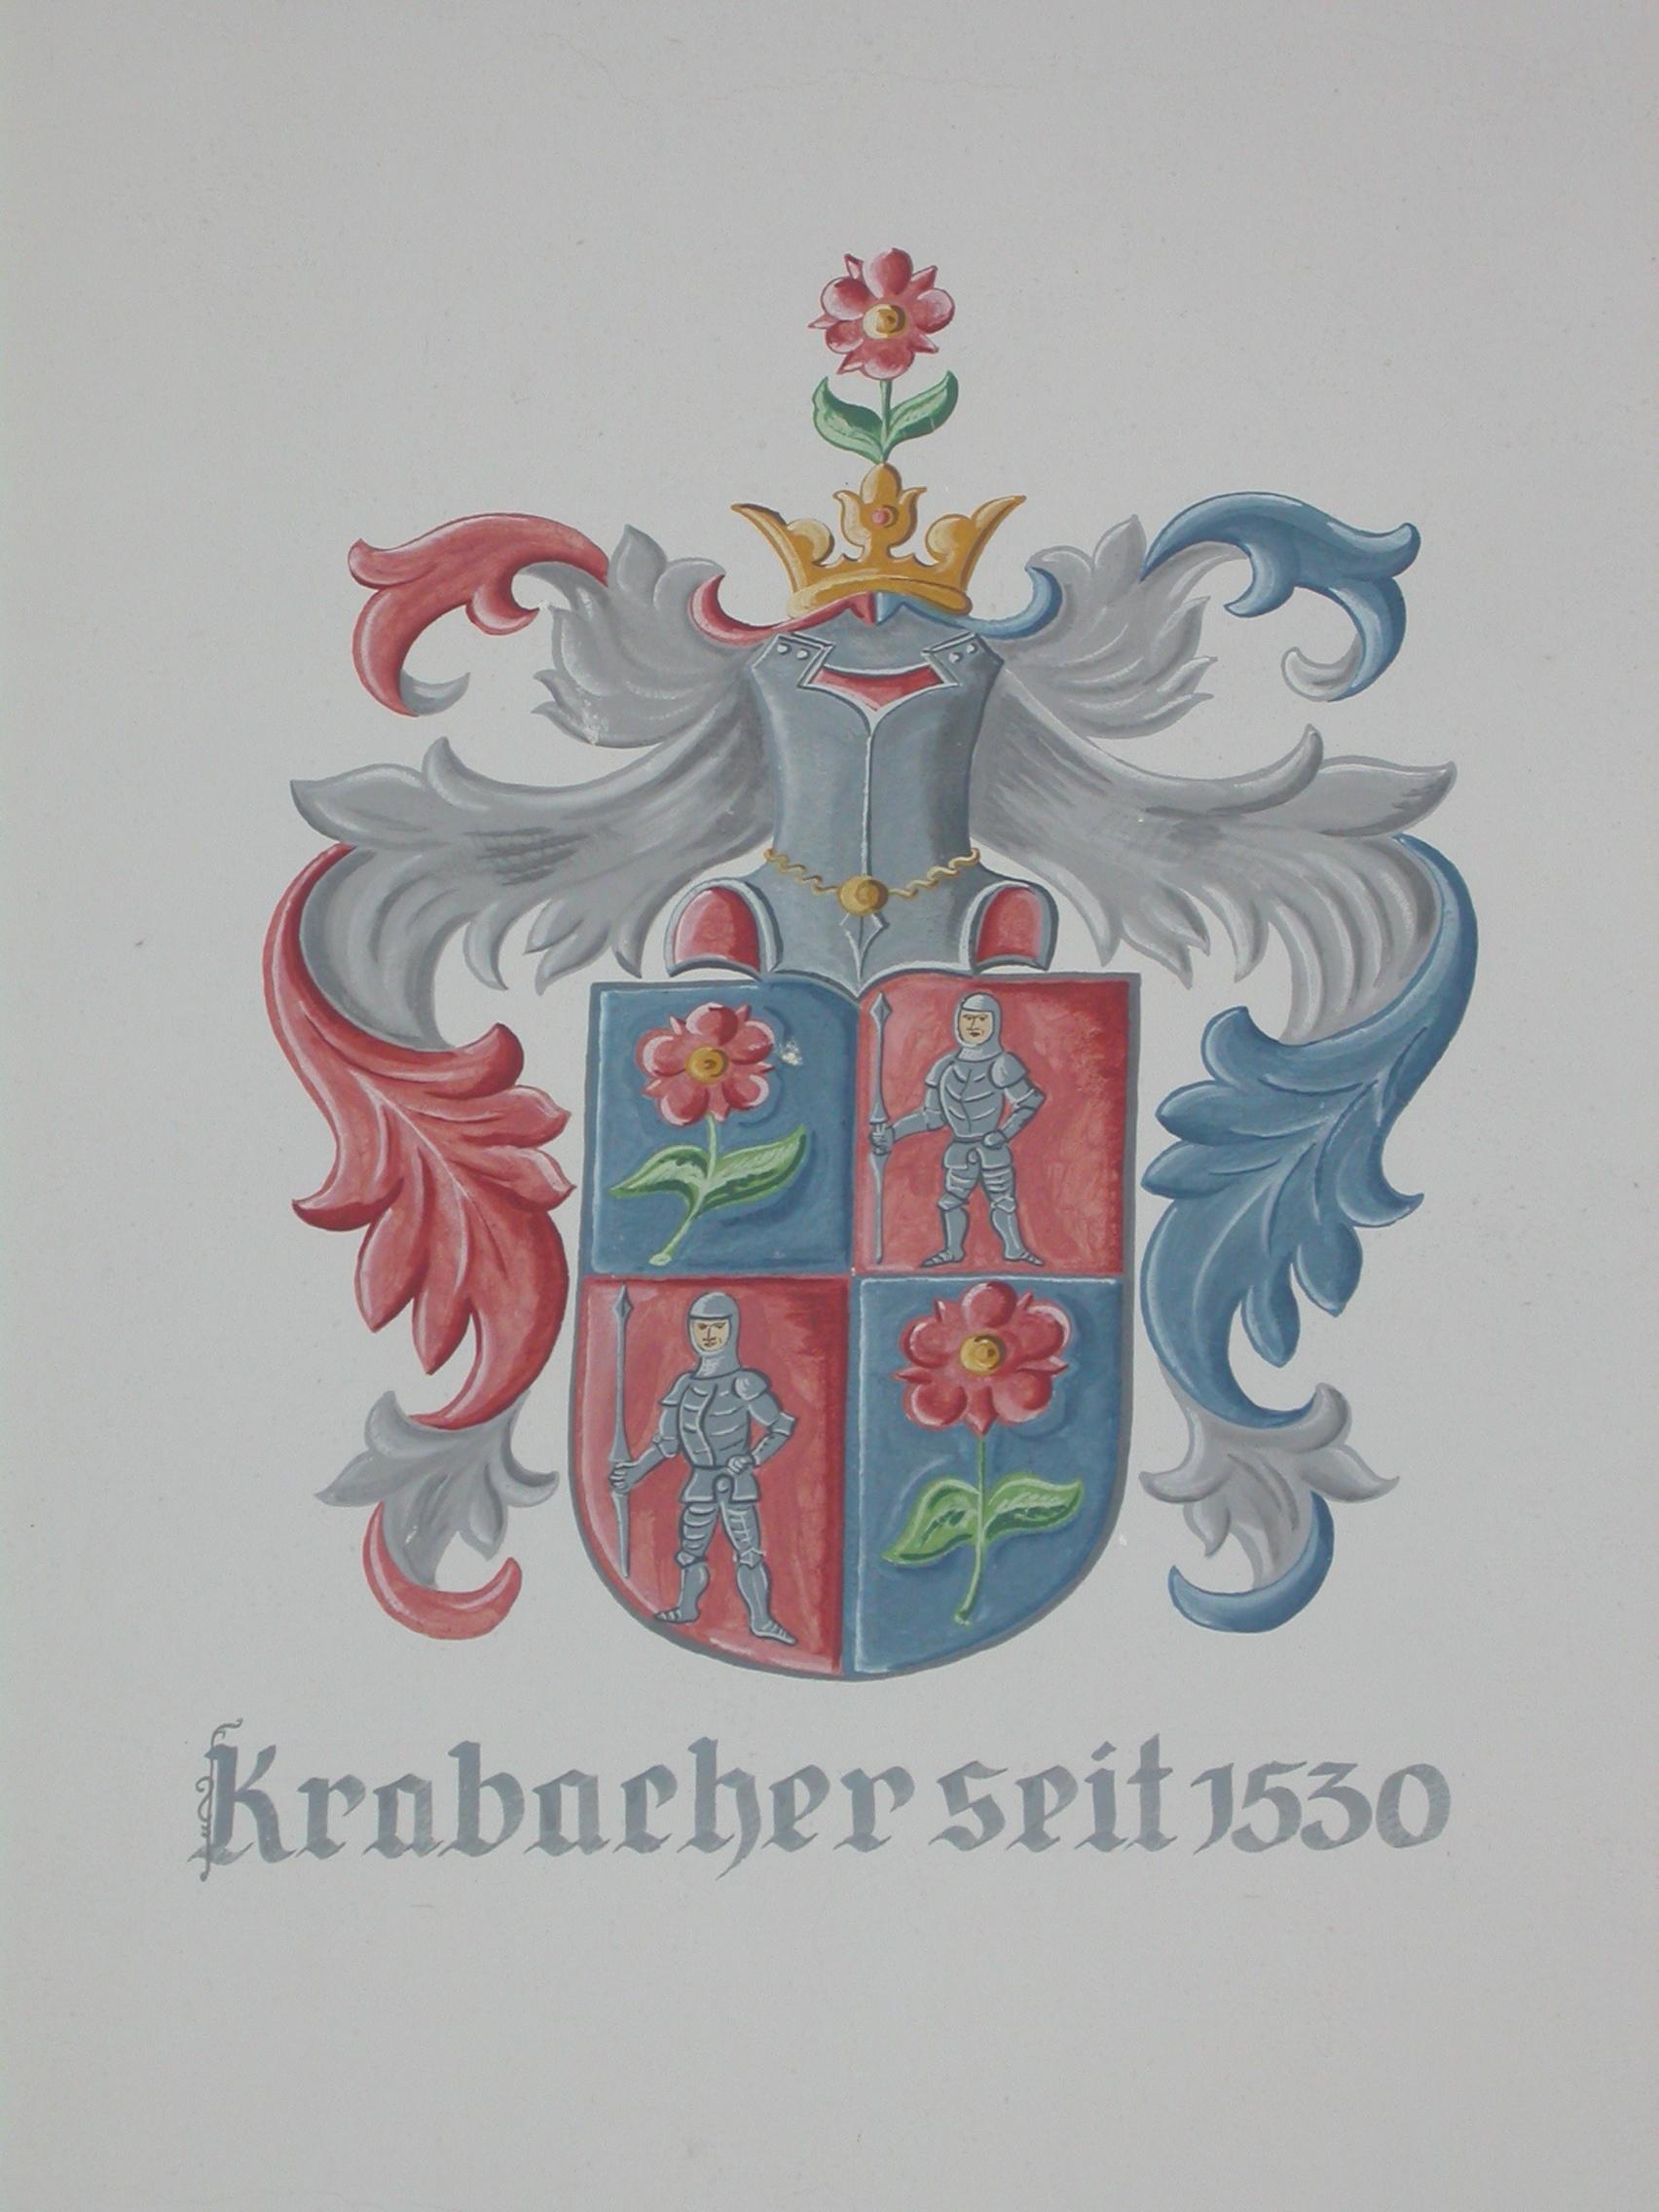 heraldry shield feathers helmet knight art paintings crown flower typography mediavel mediaval